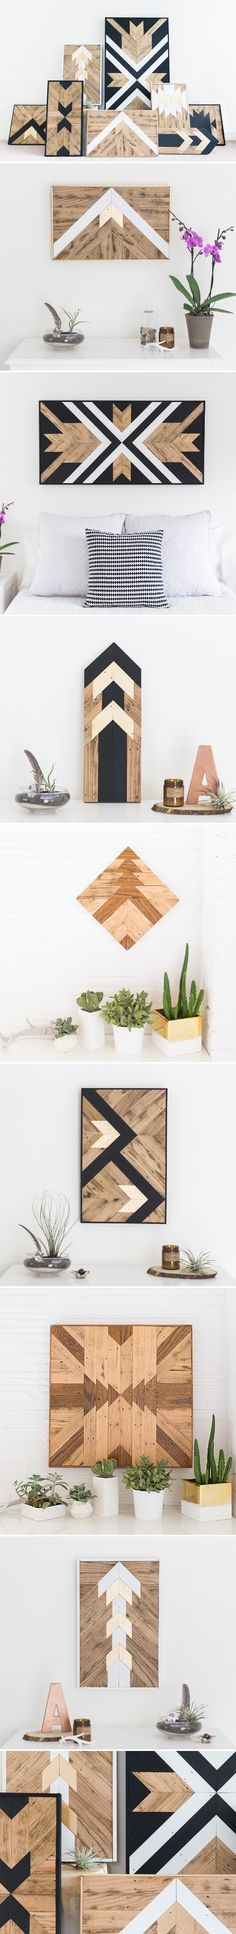 decorar-con-madera-13